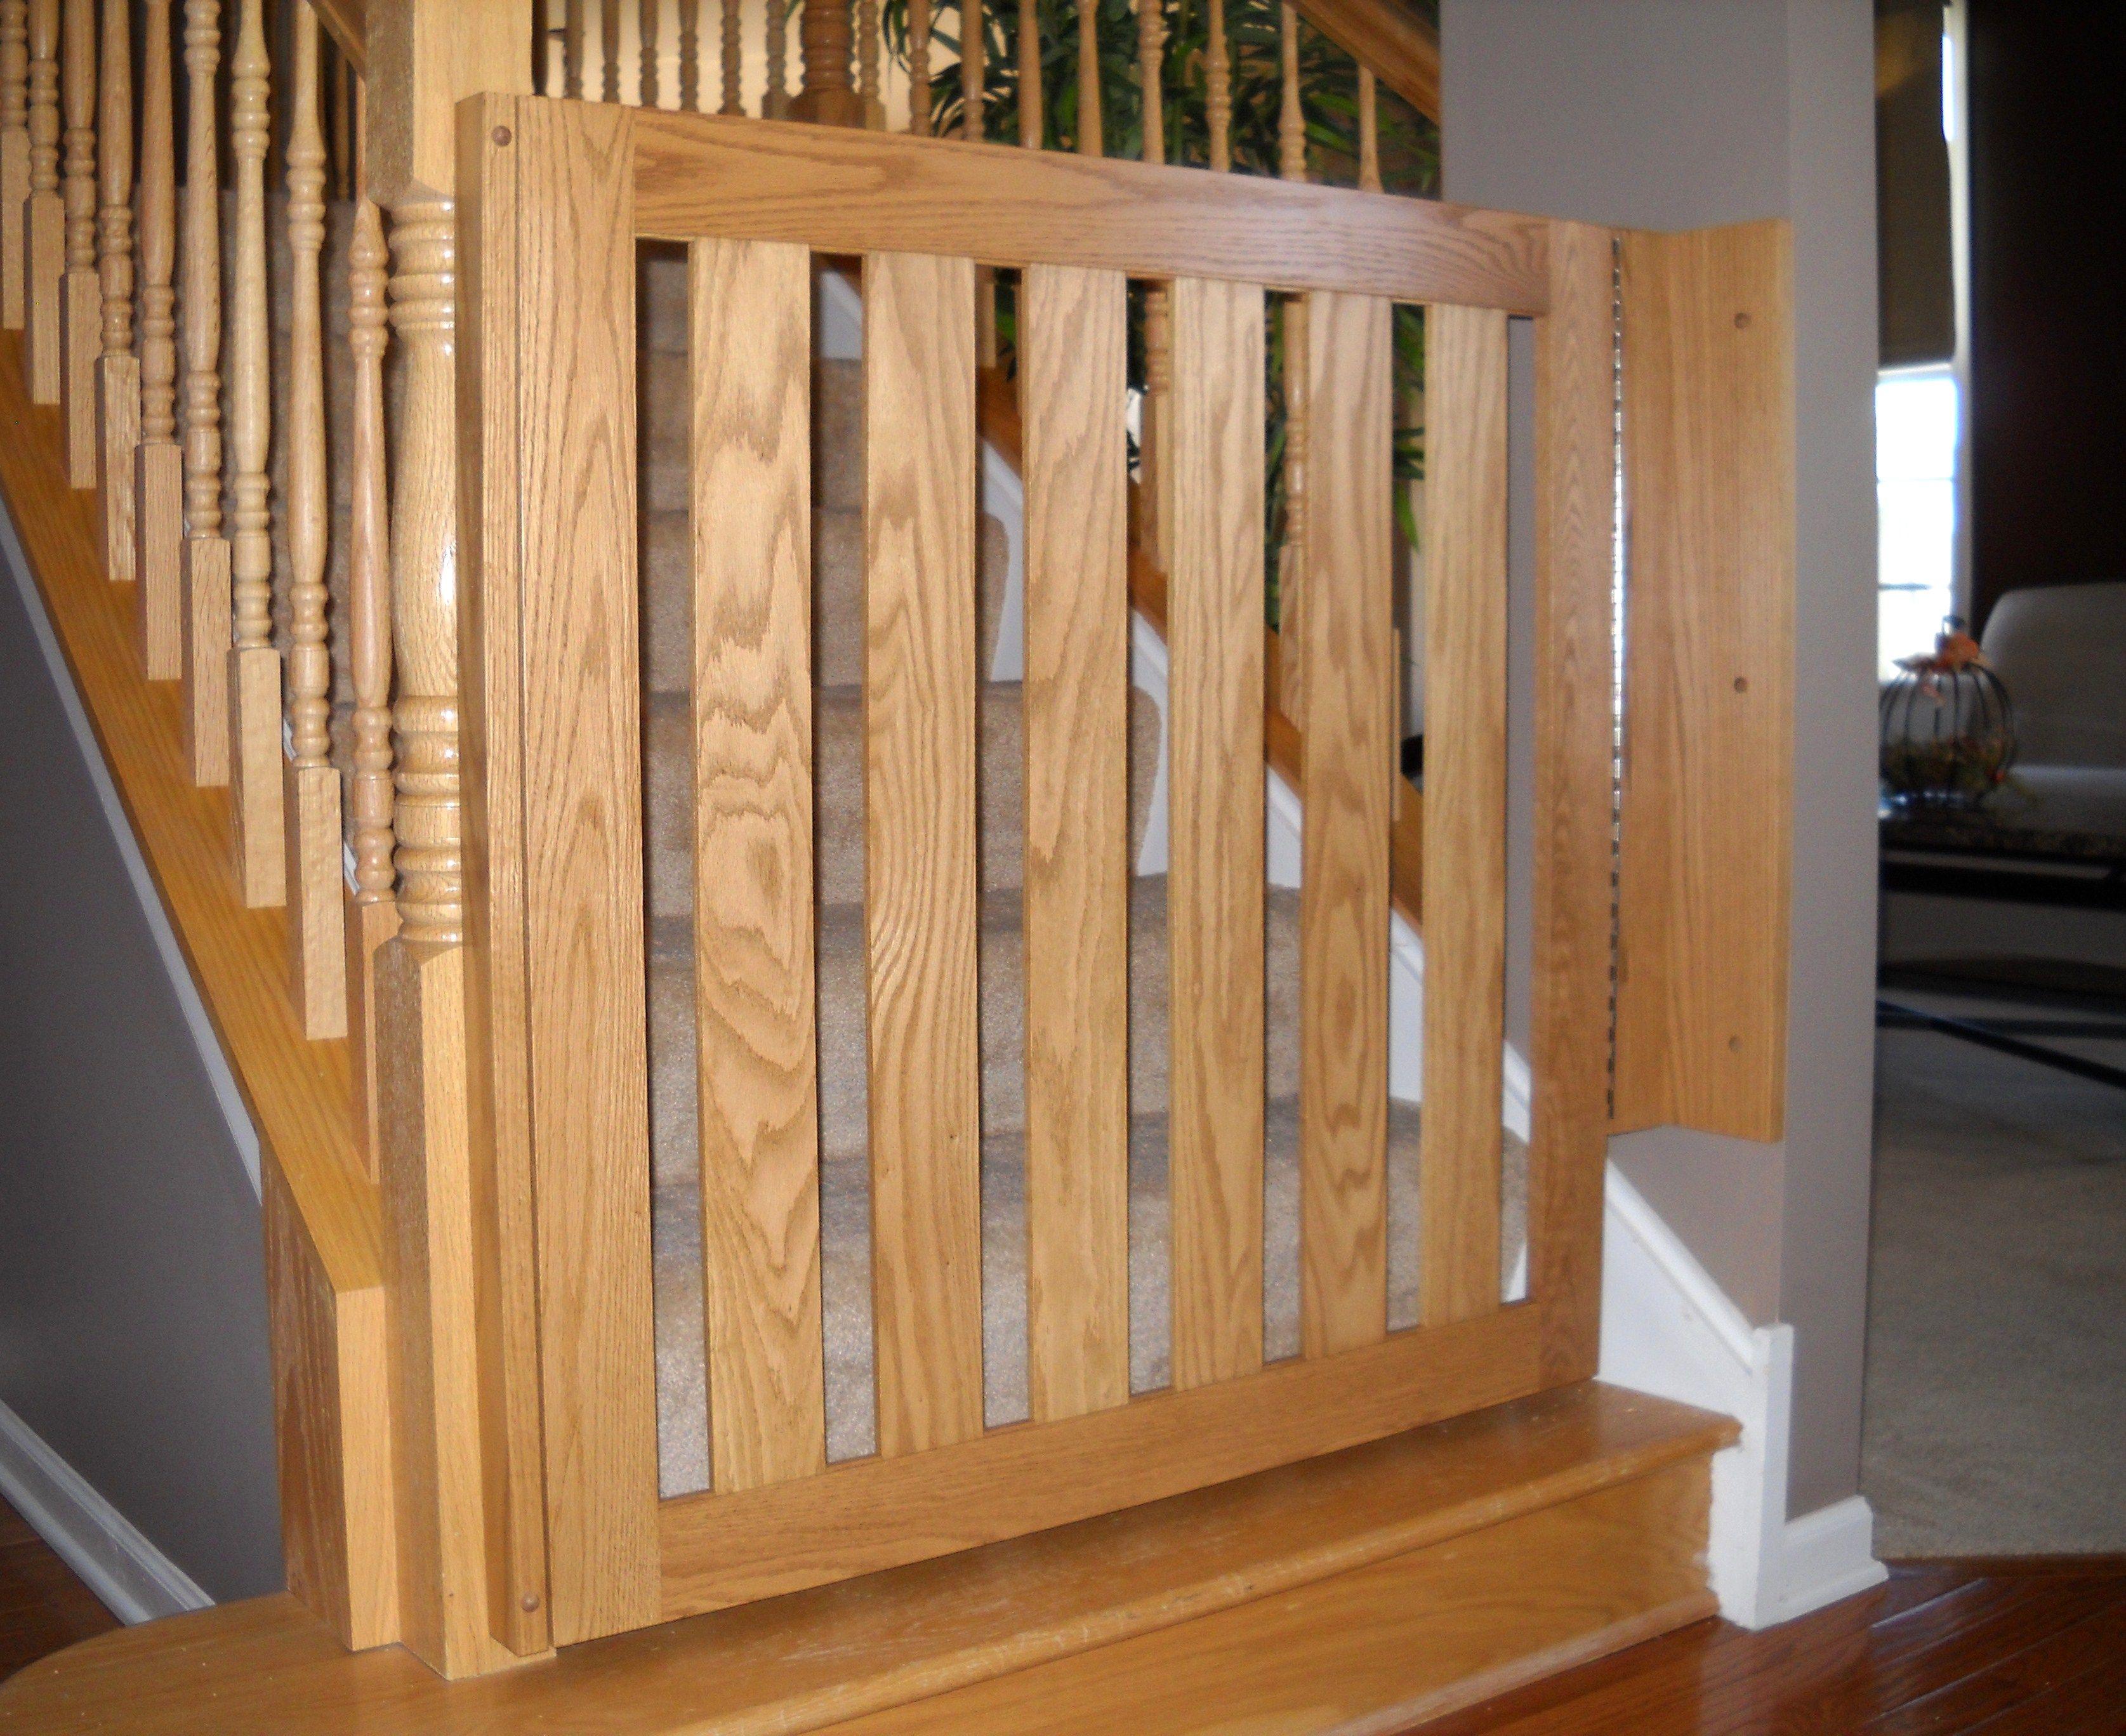 White Oak Banister Baby Gate Baby Safety Gates Child